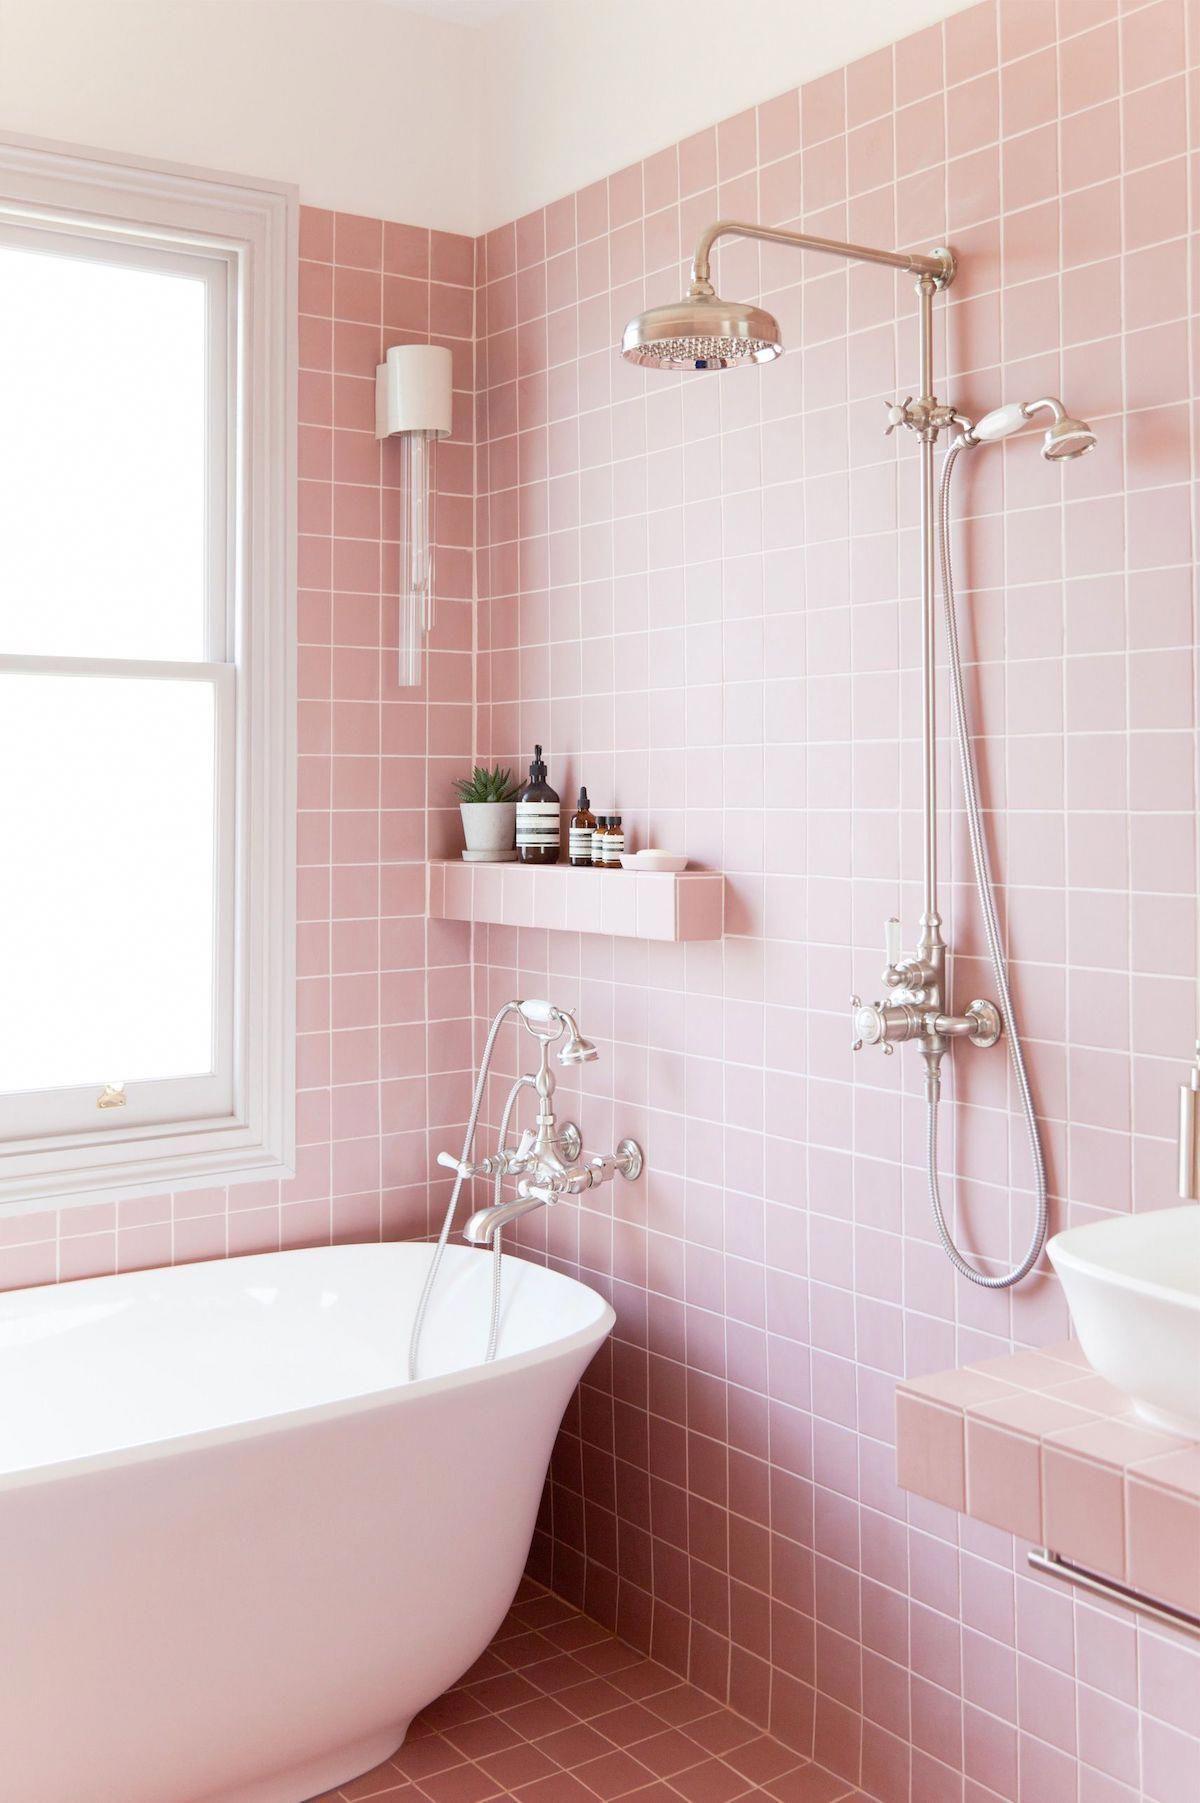 Mid Century Modern Decor Design Elements In 2020 Pink Bathroom Tiles Bathroom Interior Design Colorful Bathroom Tile